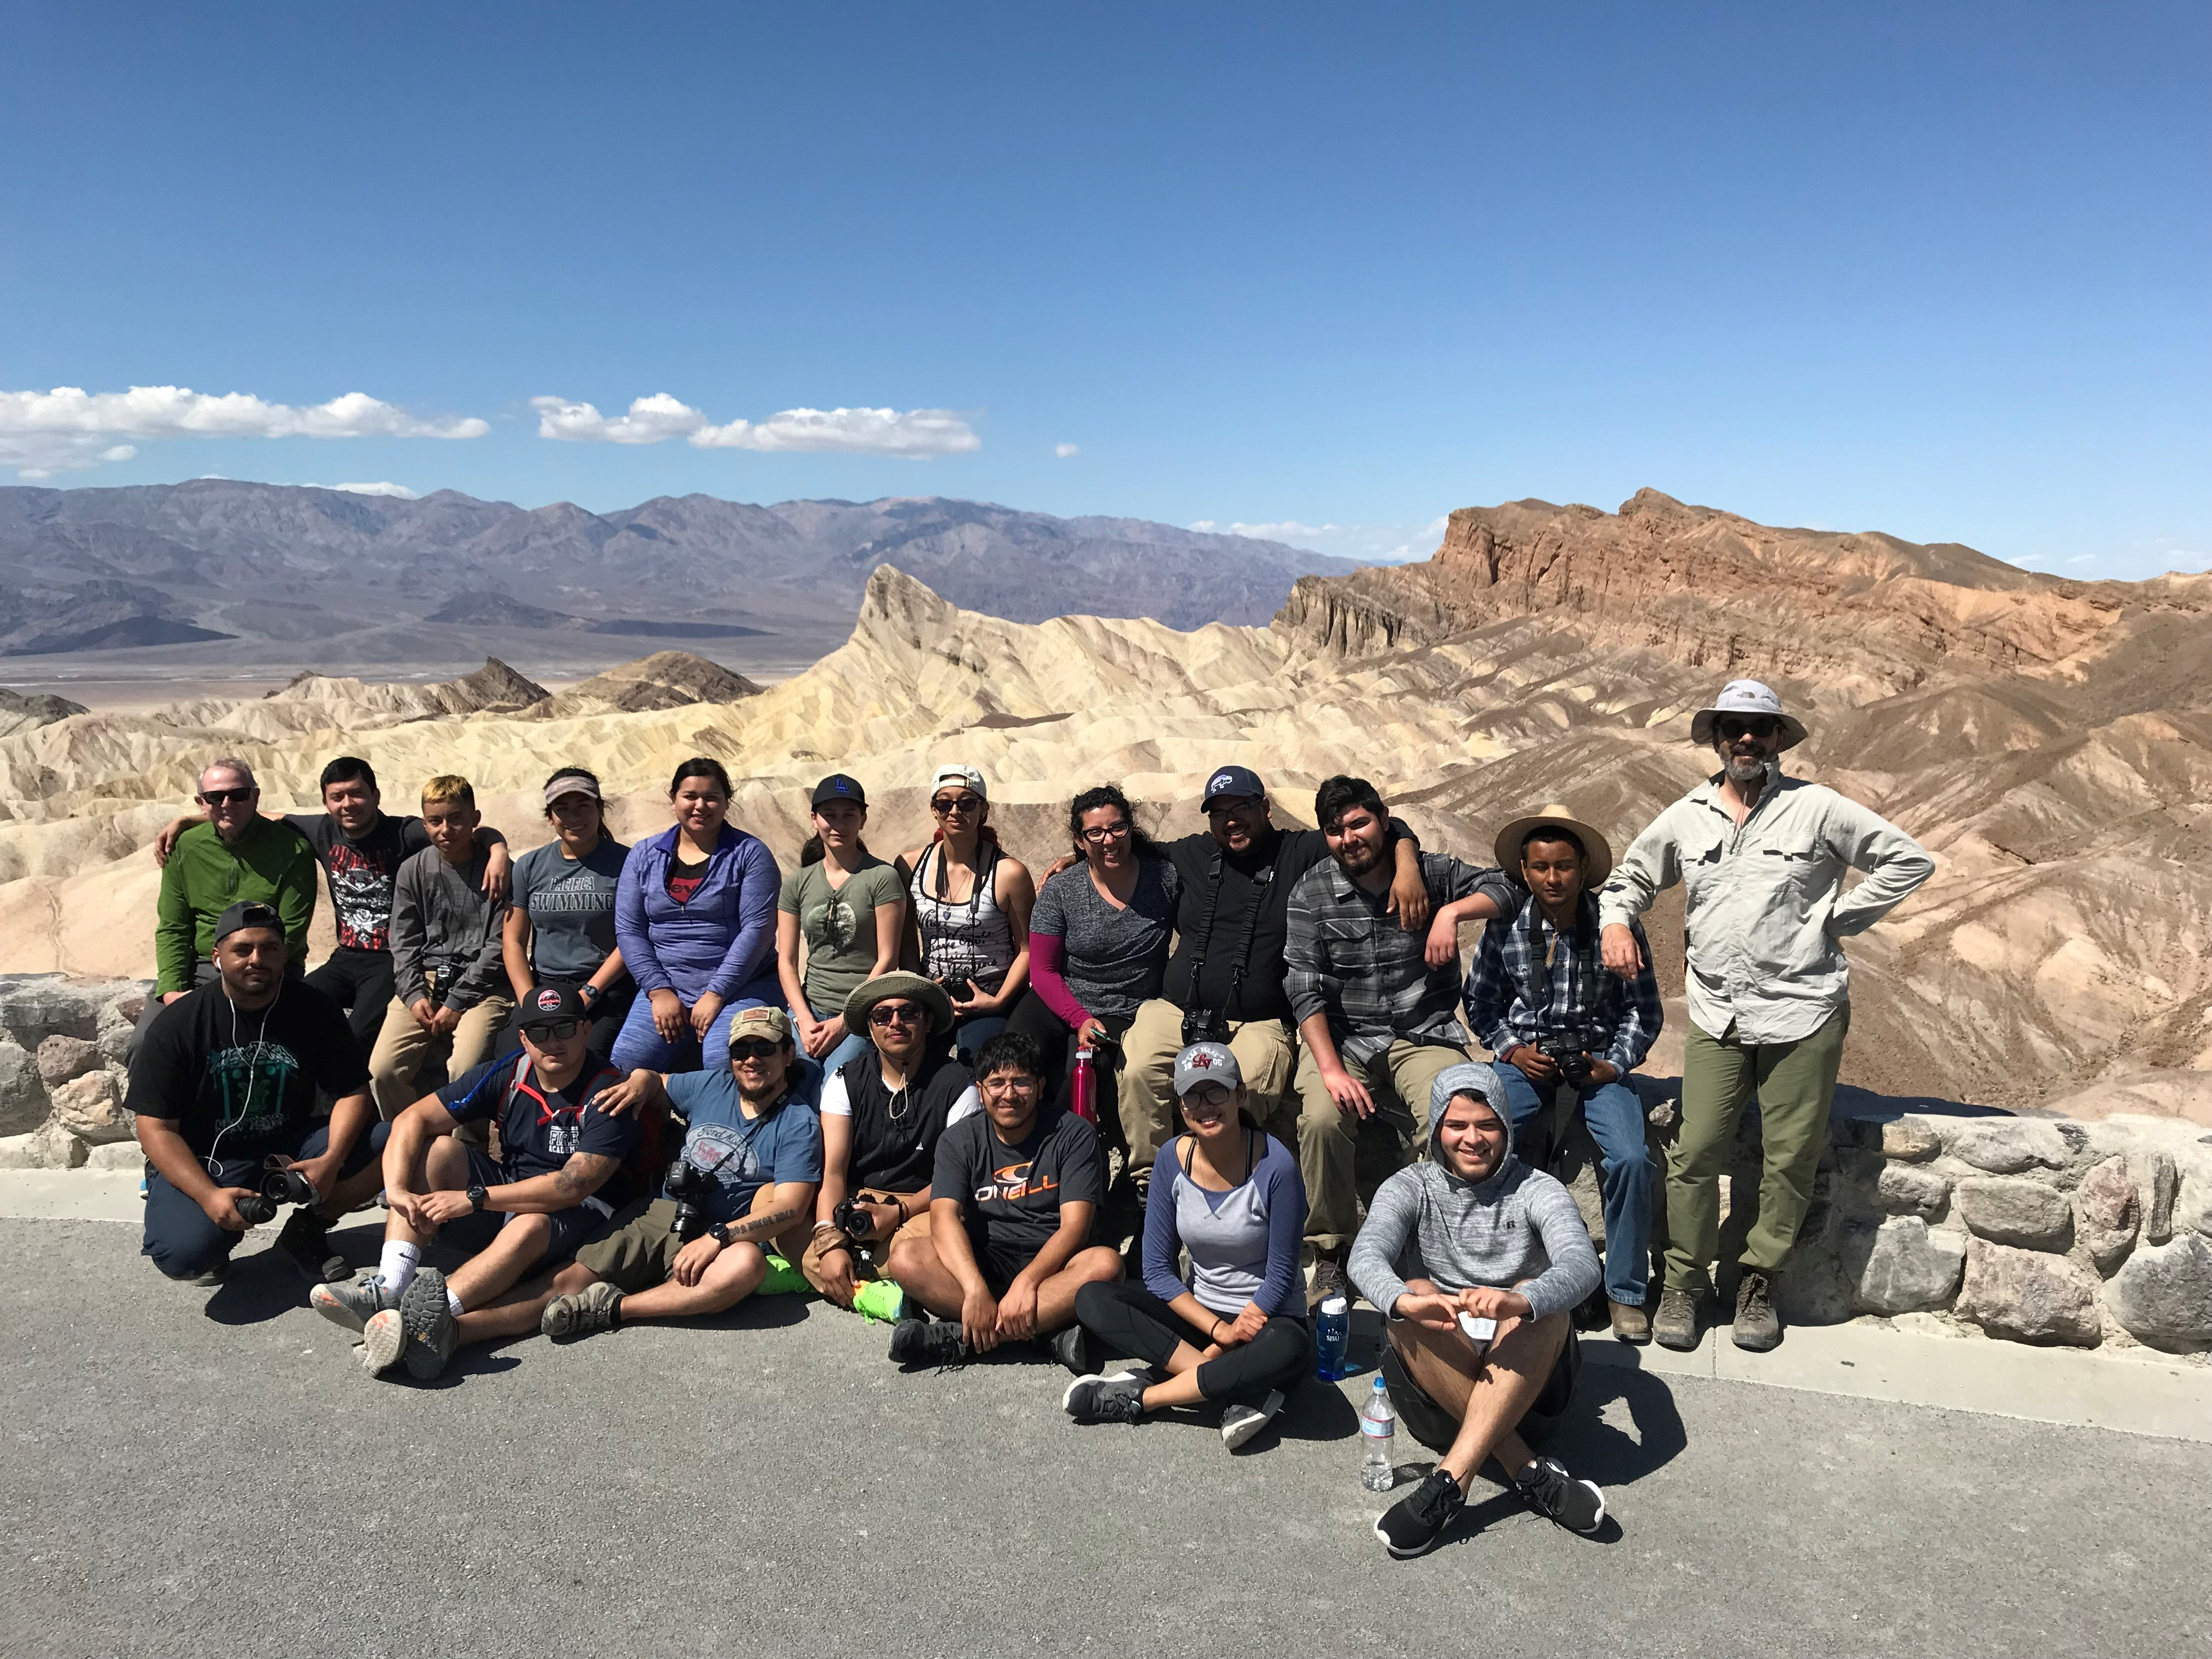 Danza class group photo of Death Valley Fieldtrip